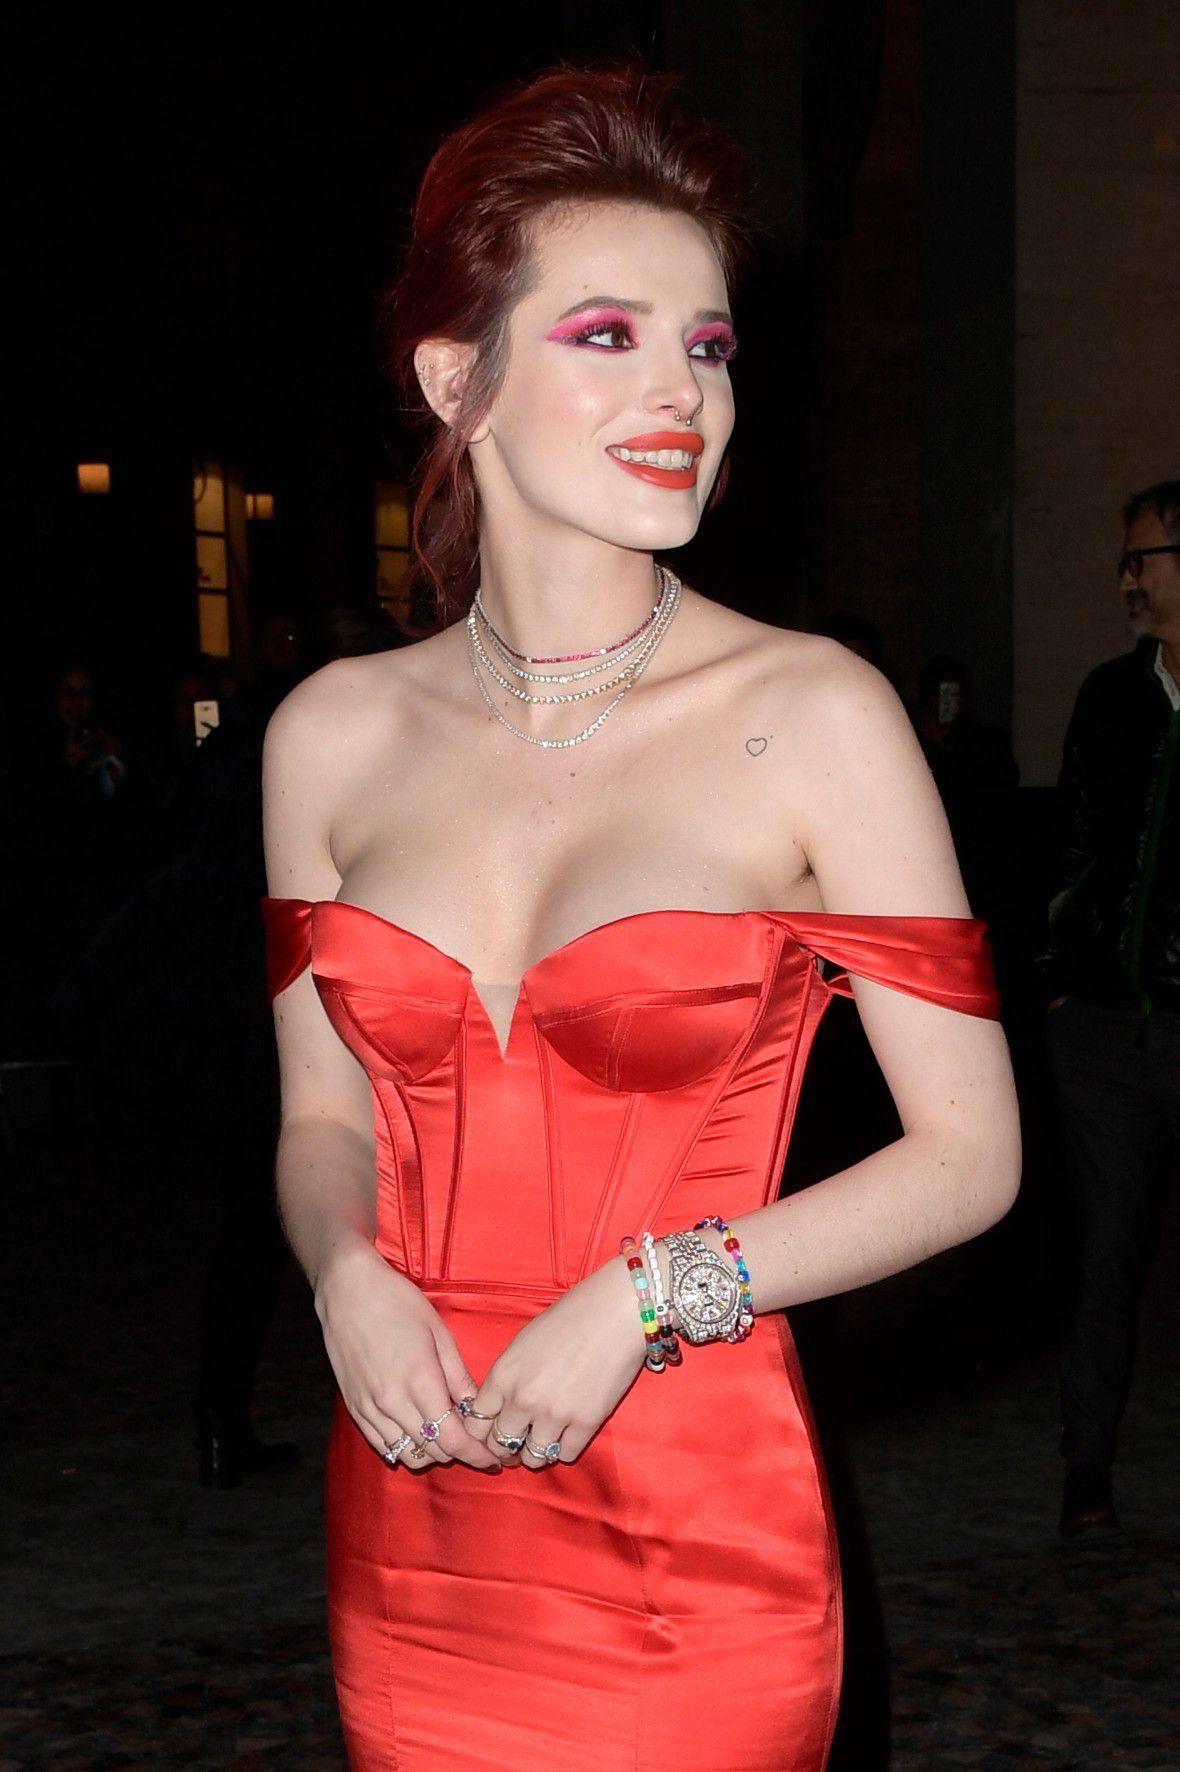 bella-thorne-deep-cleavage-at-midnight-run-premiere-in-rome-5421